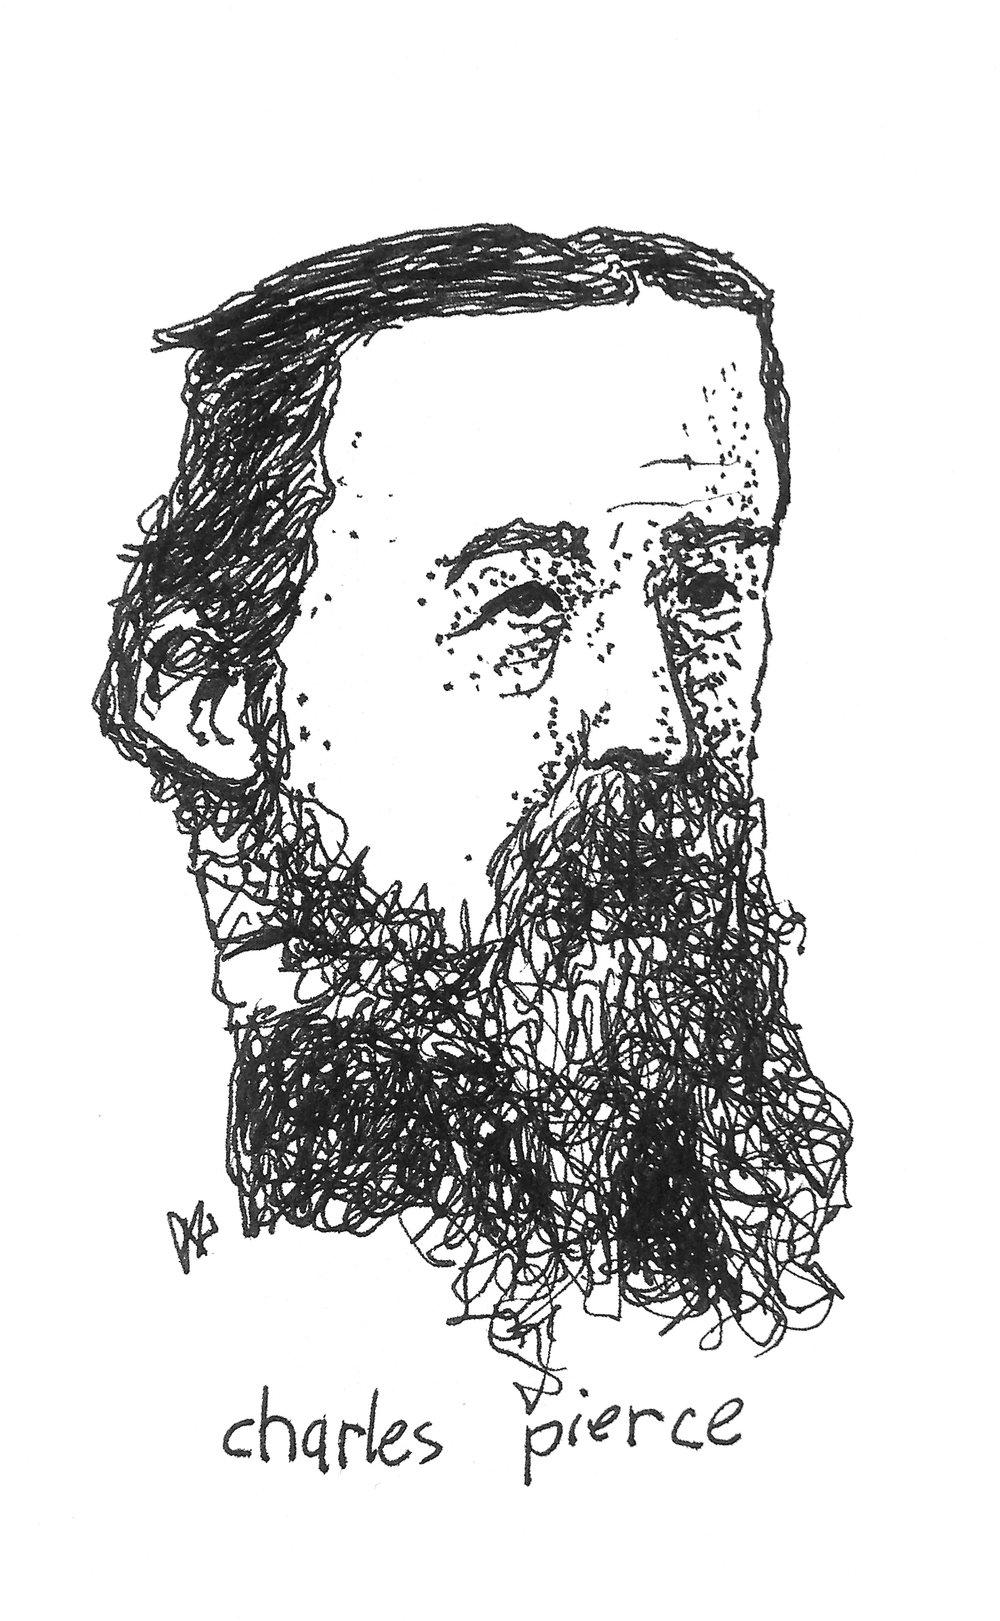 CharlesPierce.JPG